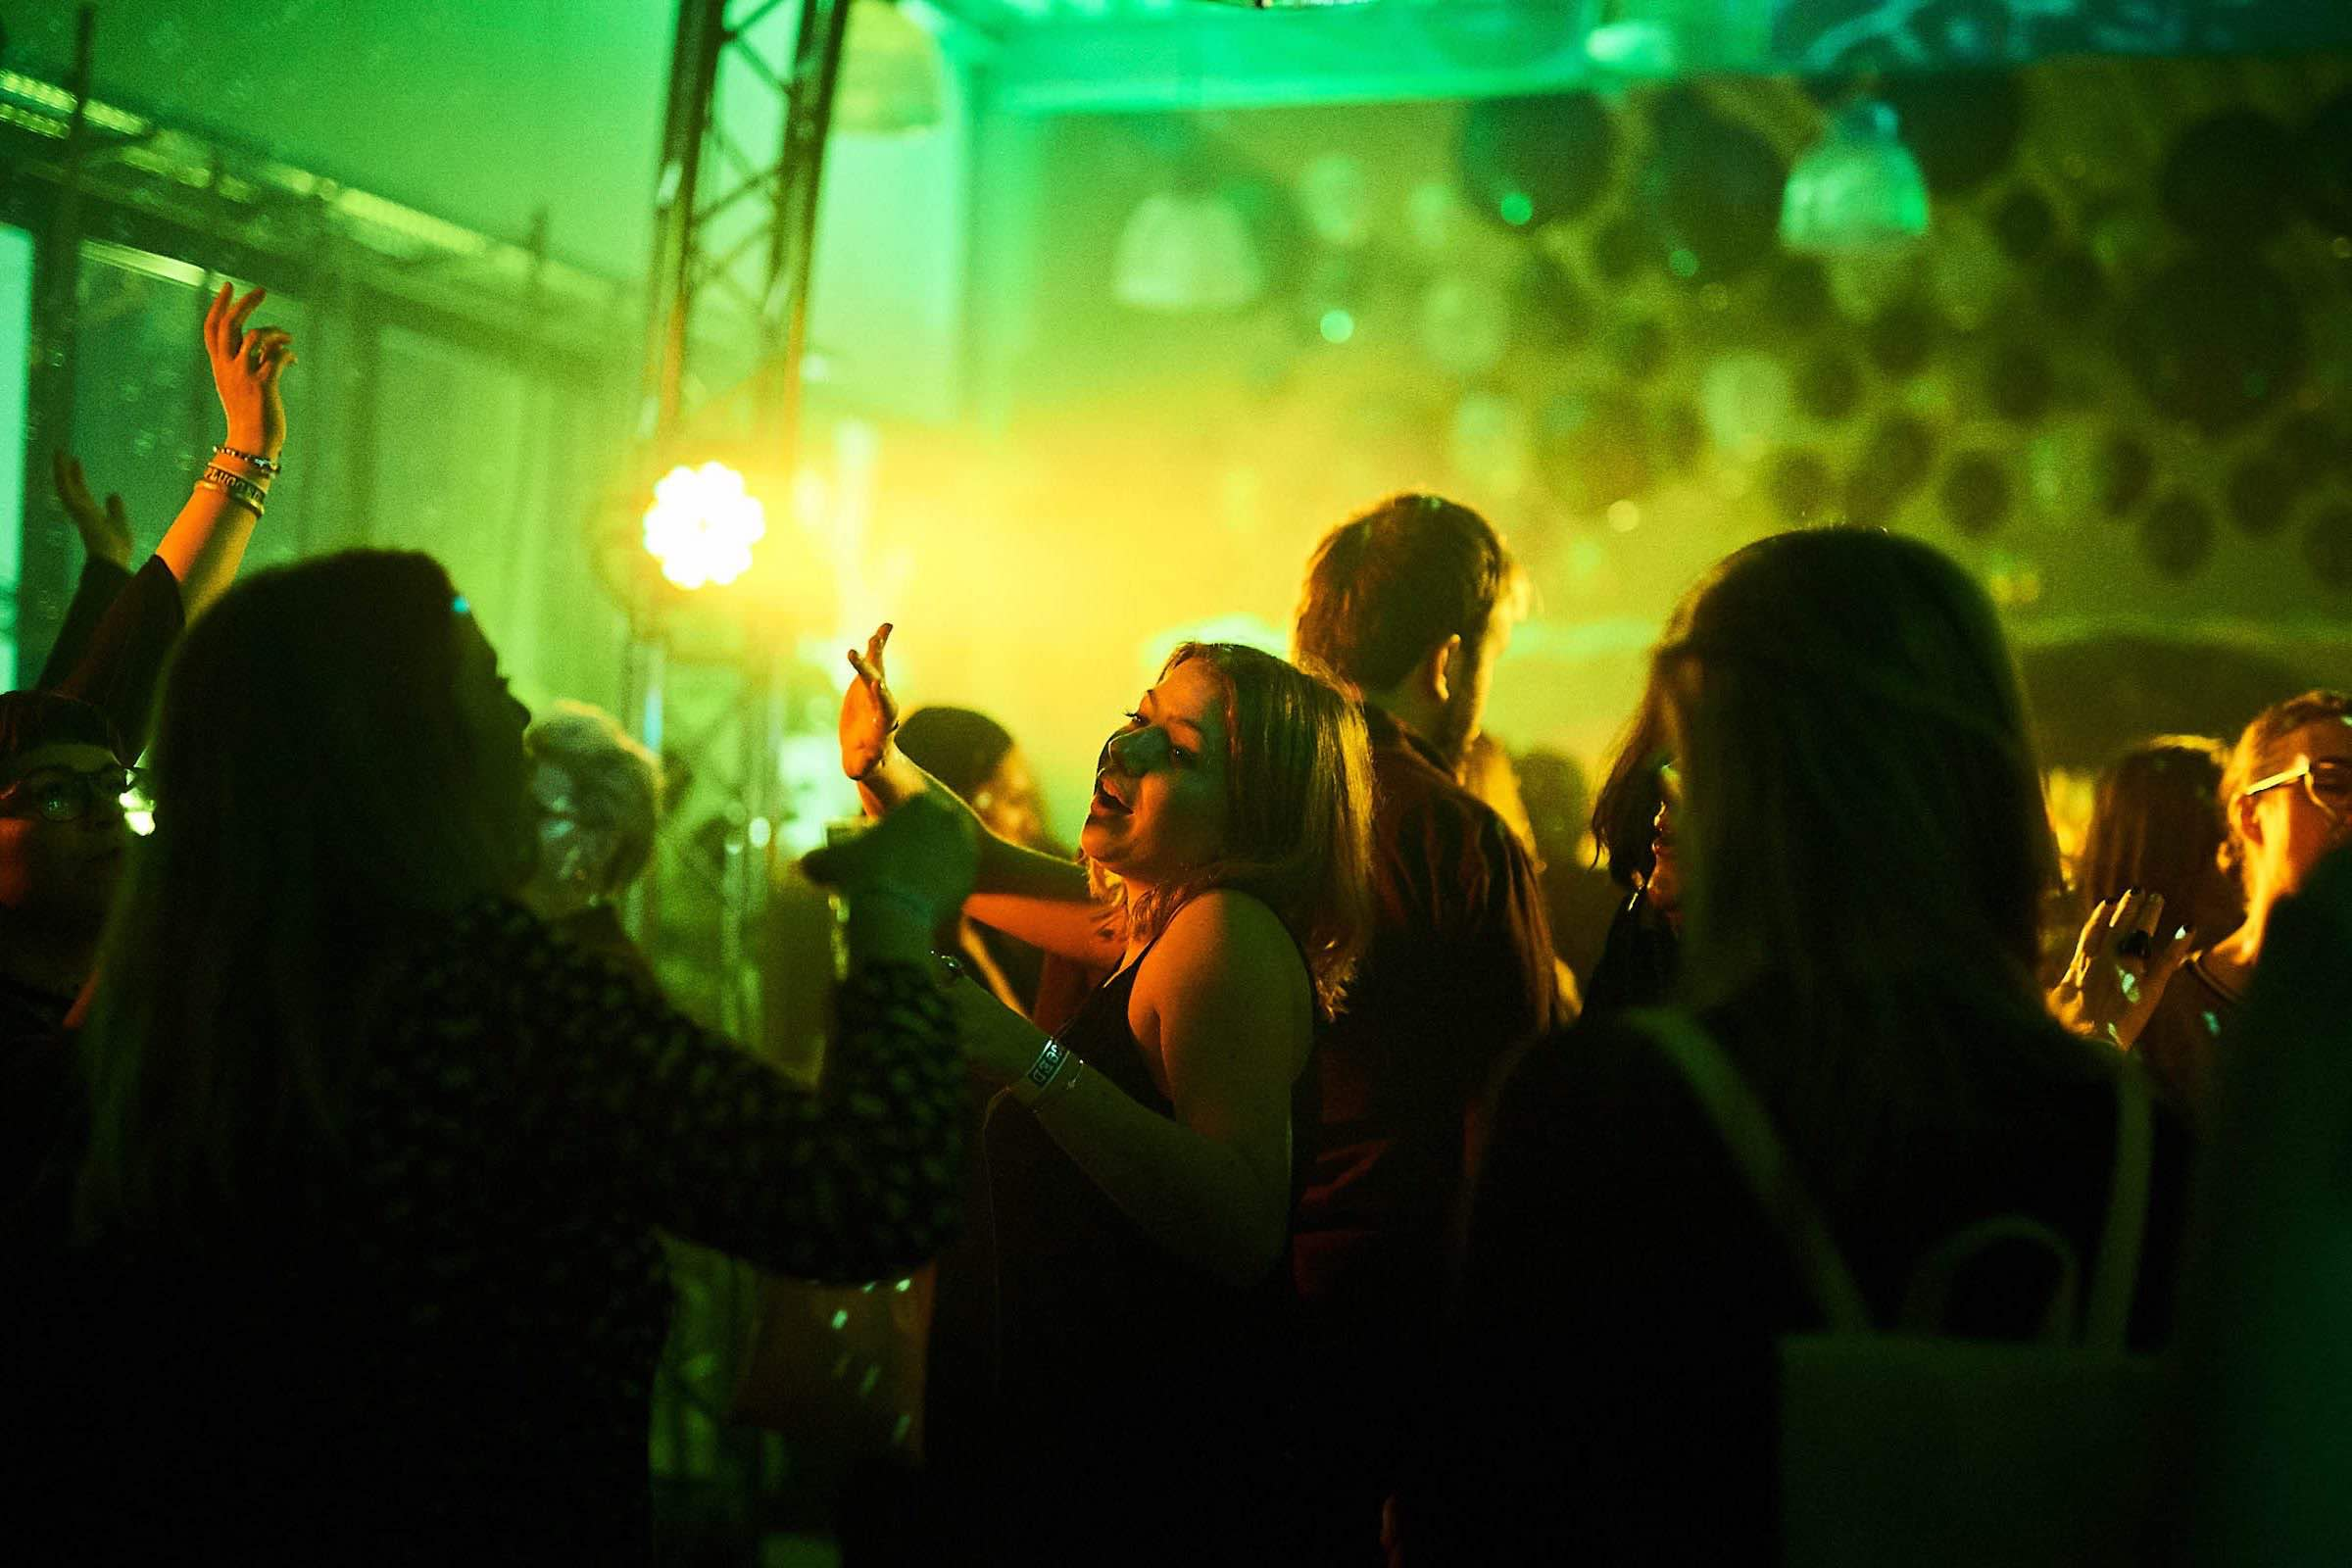 DJ | Firmenfeier | DJ | Agentur | Hamburg | DJ | Service | Hochzeits | DJ | Messe | DJ | Firmenevent | DJ | Geburtstag | Discjockey | Weihnachtsfeier | DJ | Sommerfest | Event | Buchen | Mieten | Hamburgfeiert